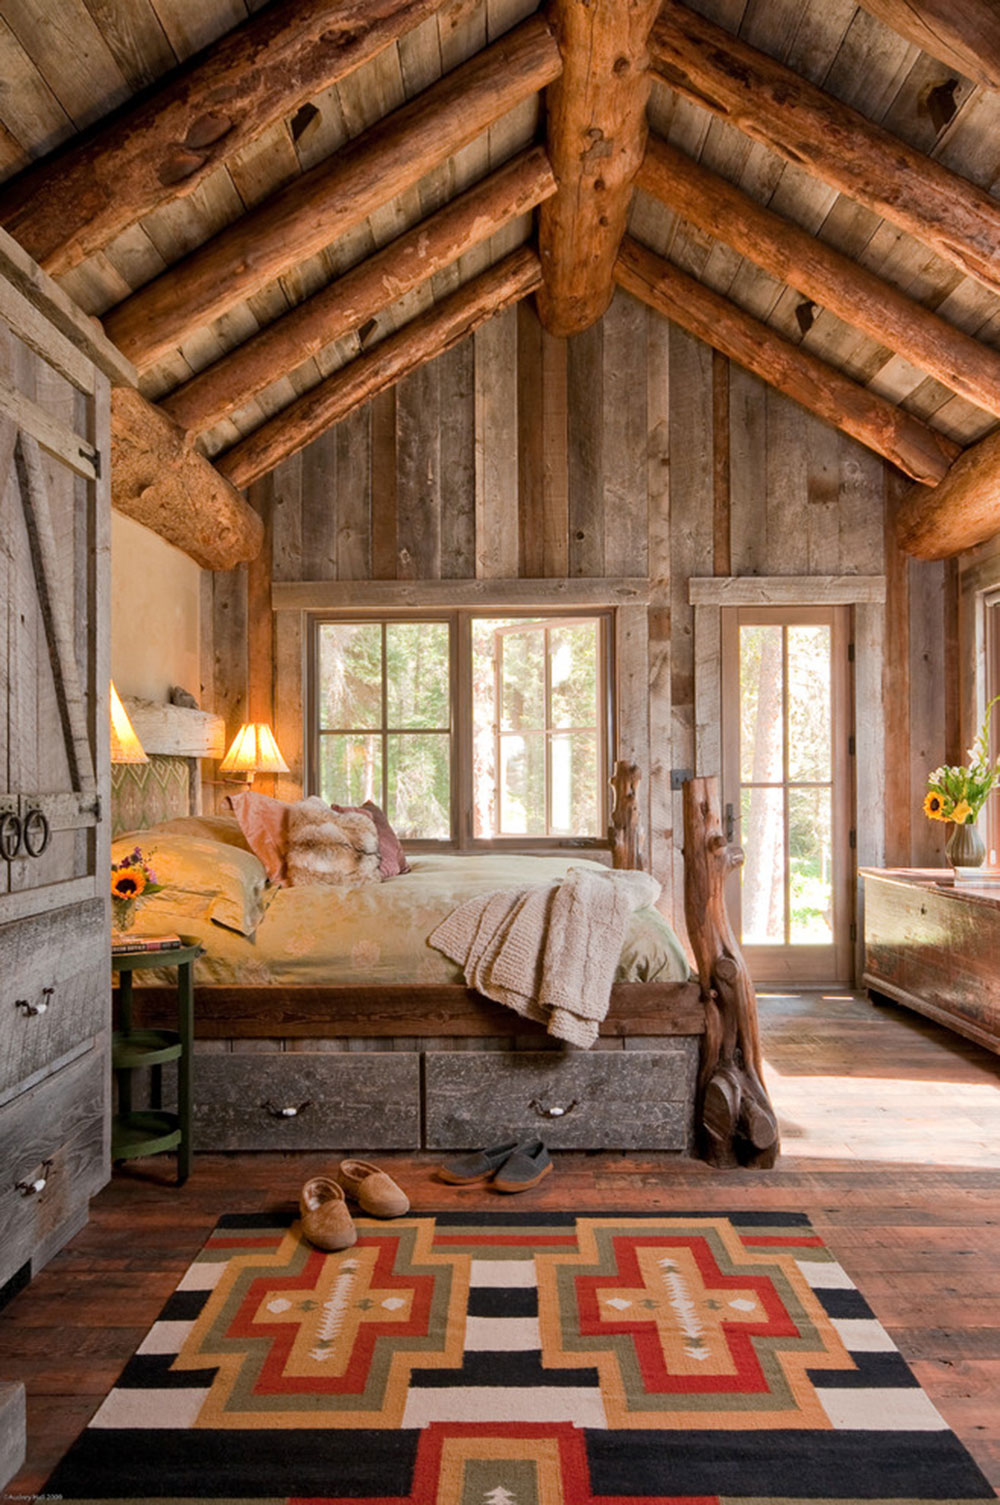 rustic bedroom design ideas which radiate comfort